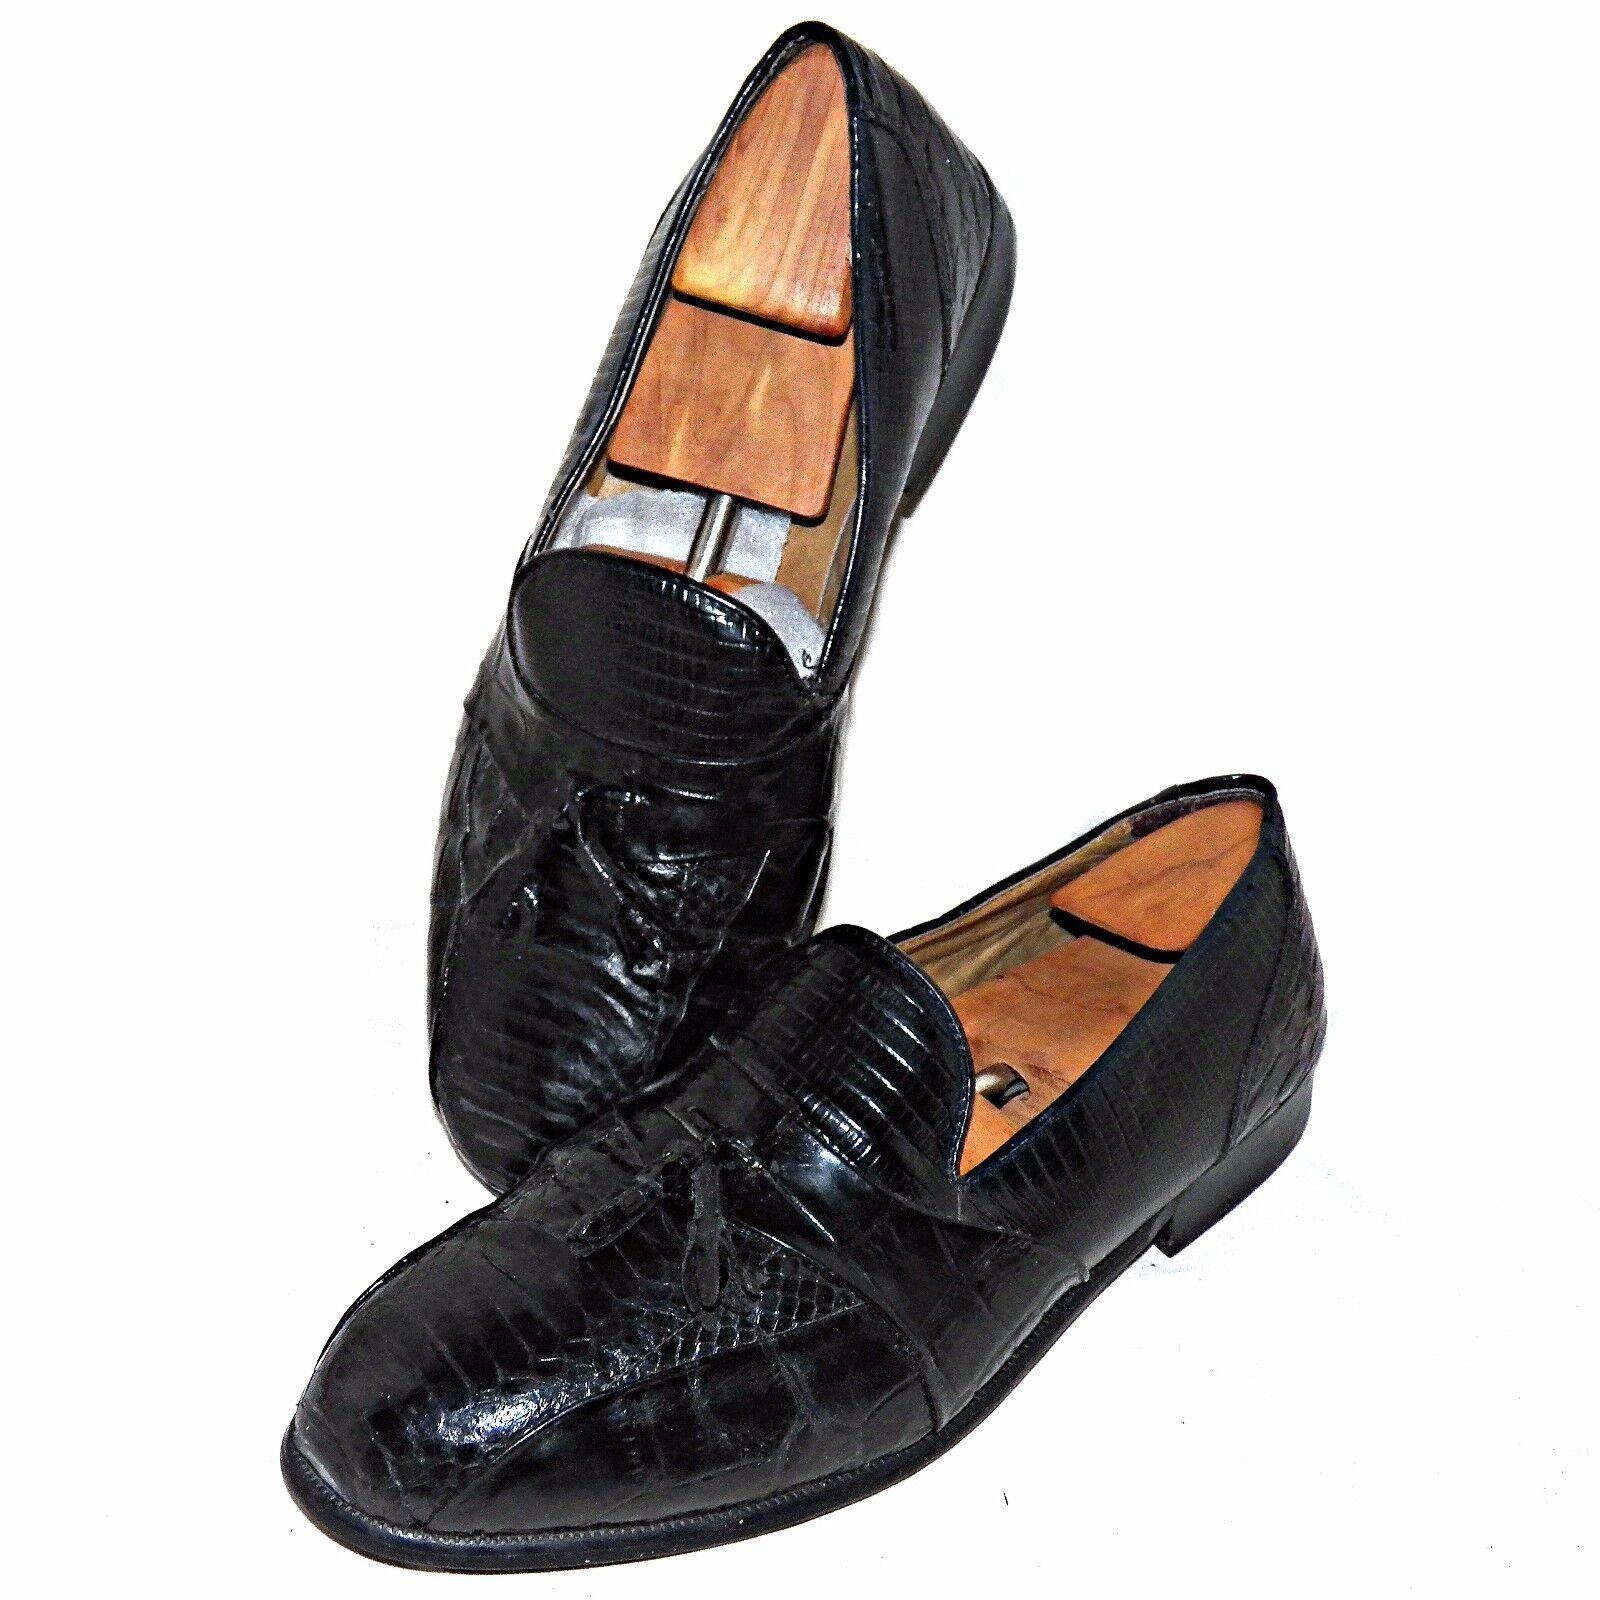 Stacy Adams Genuine Snakeskin Croc Print Leather Alberto Tassel Loafers 13 Wide